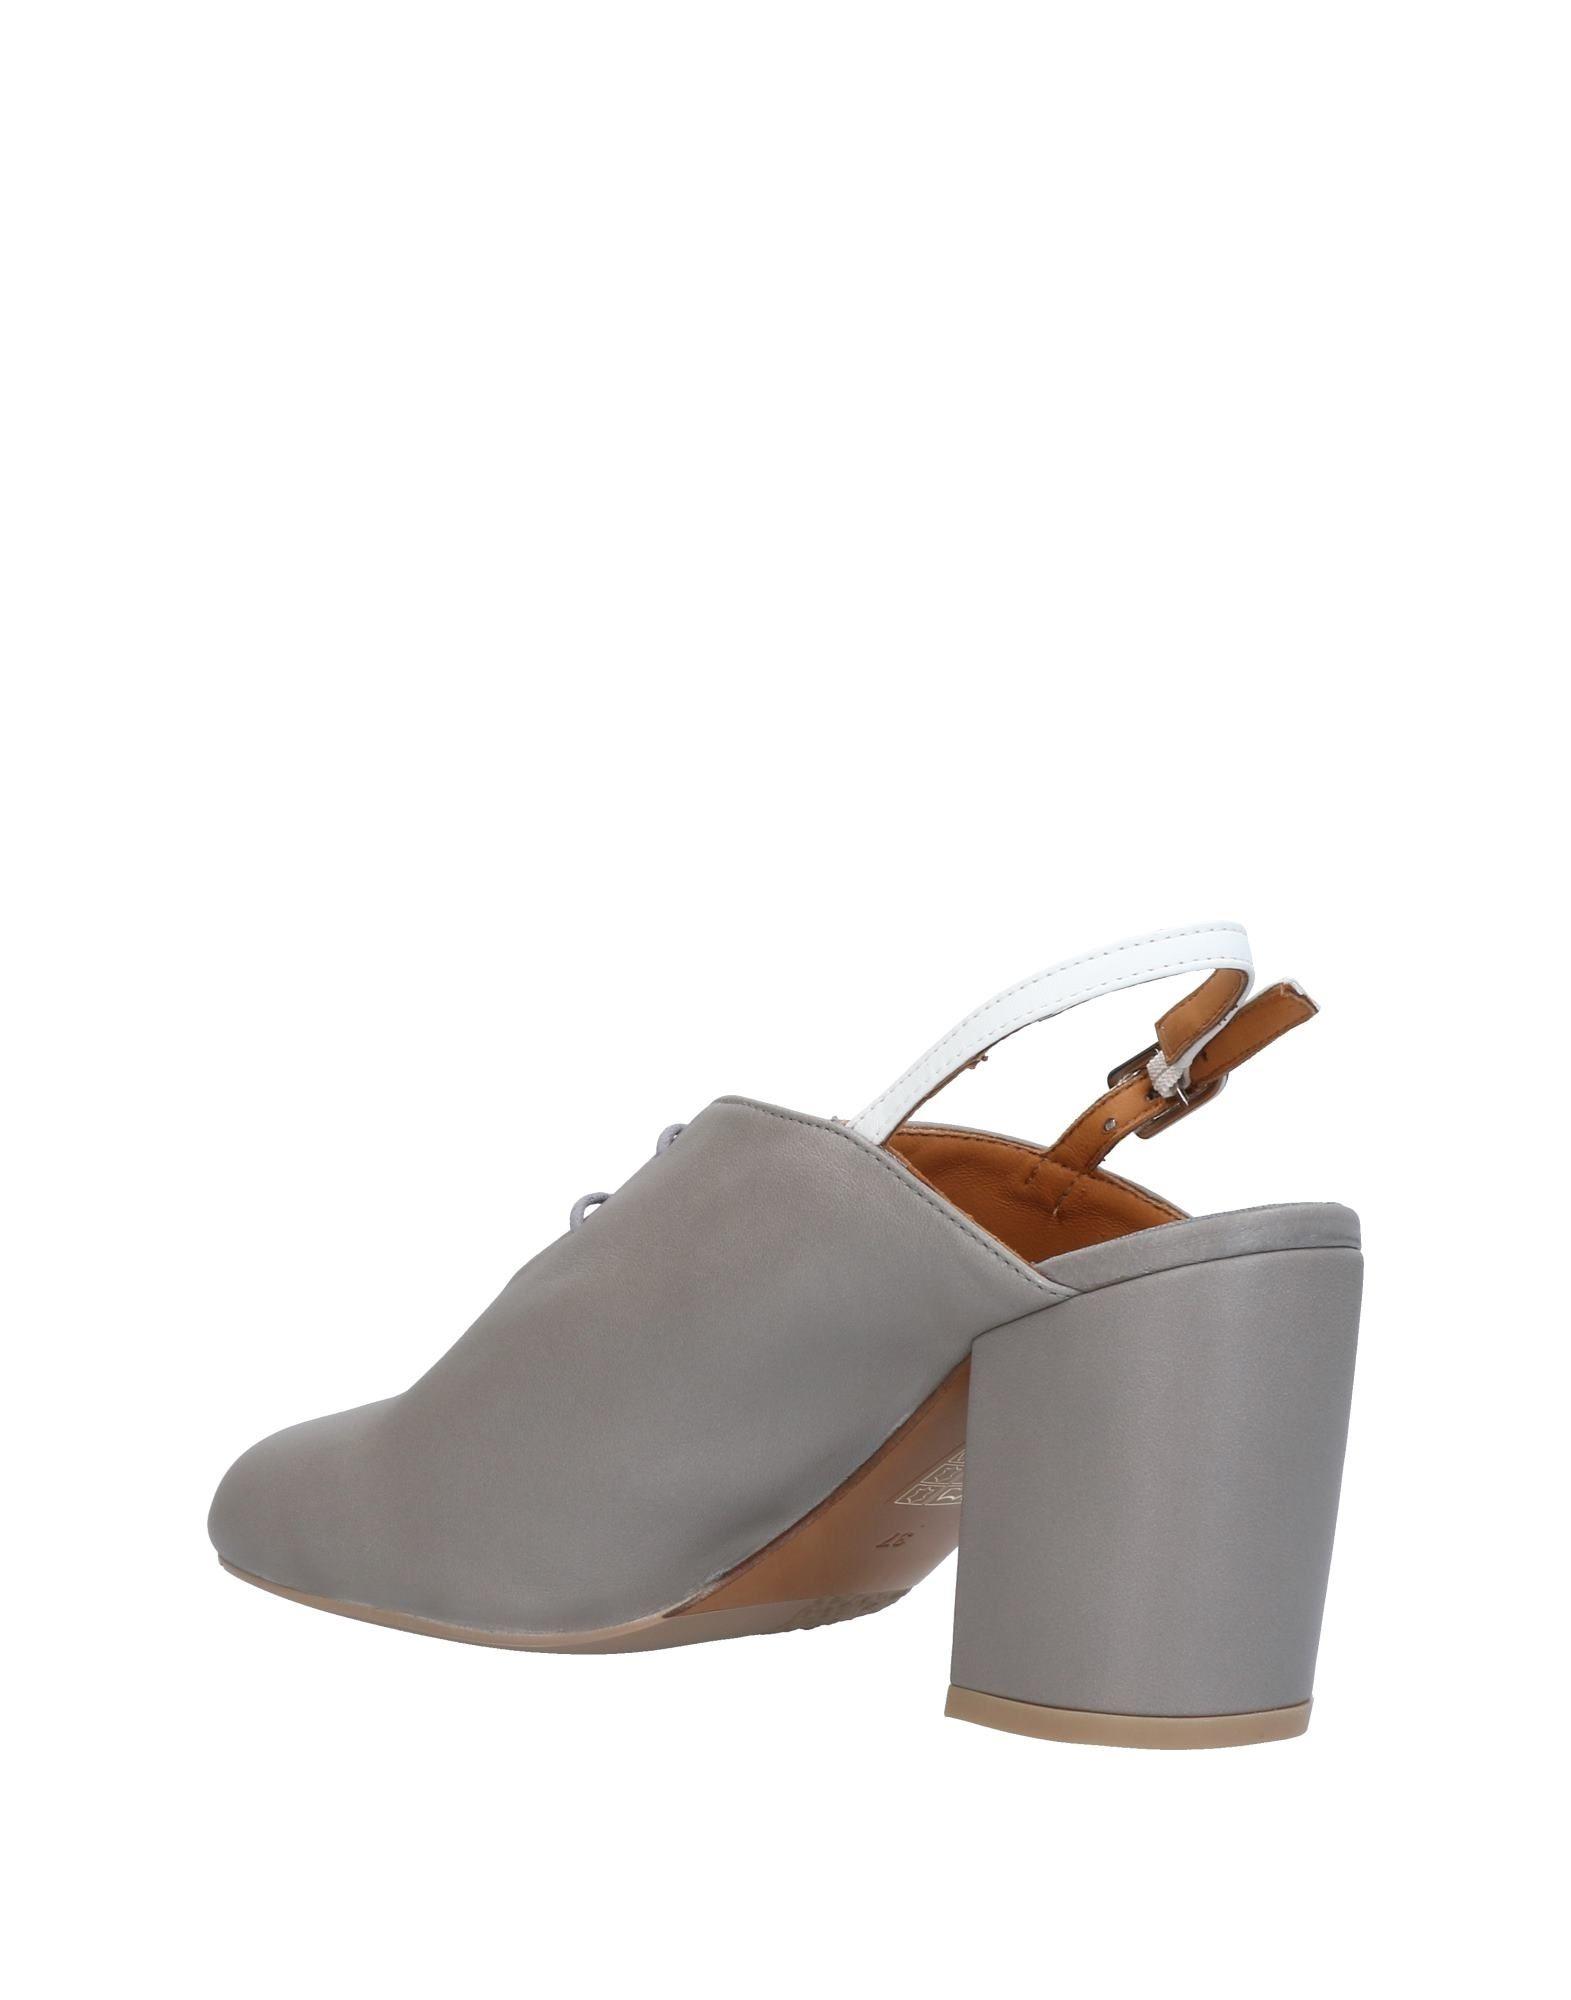 Audley Schnürschuhe Damen  11439305FK Gute Qualität beliebte Schuhe